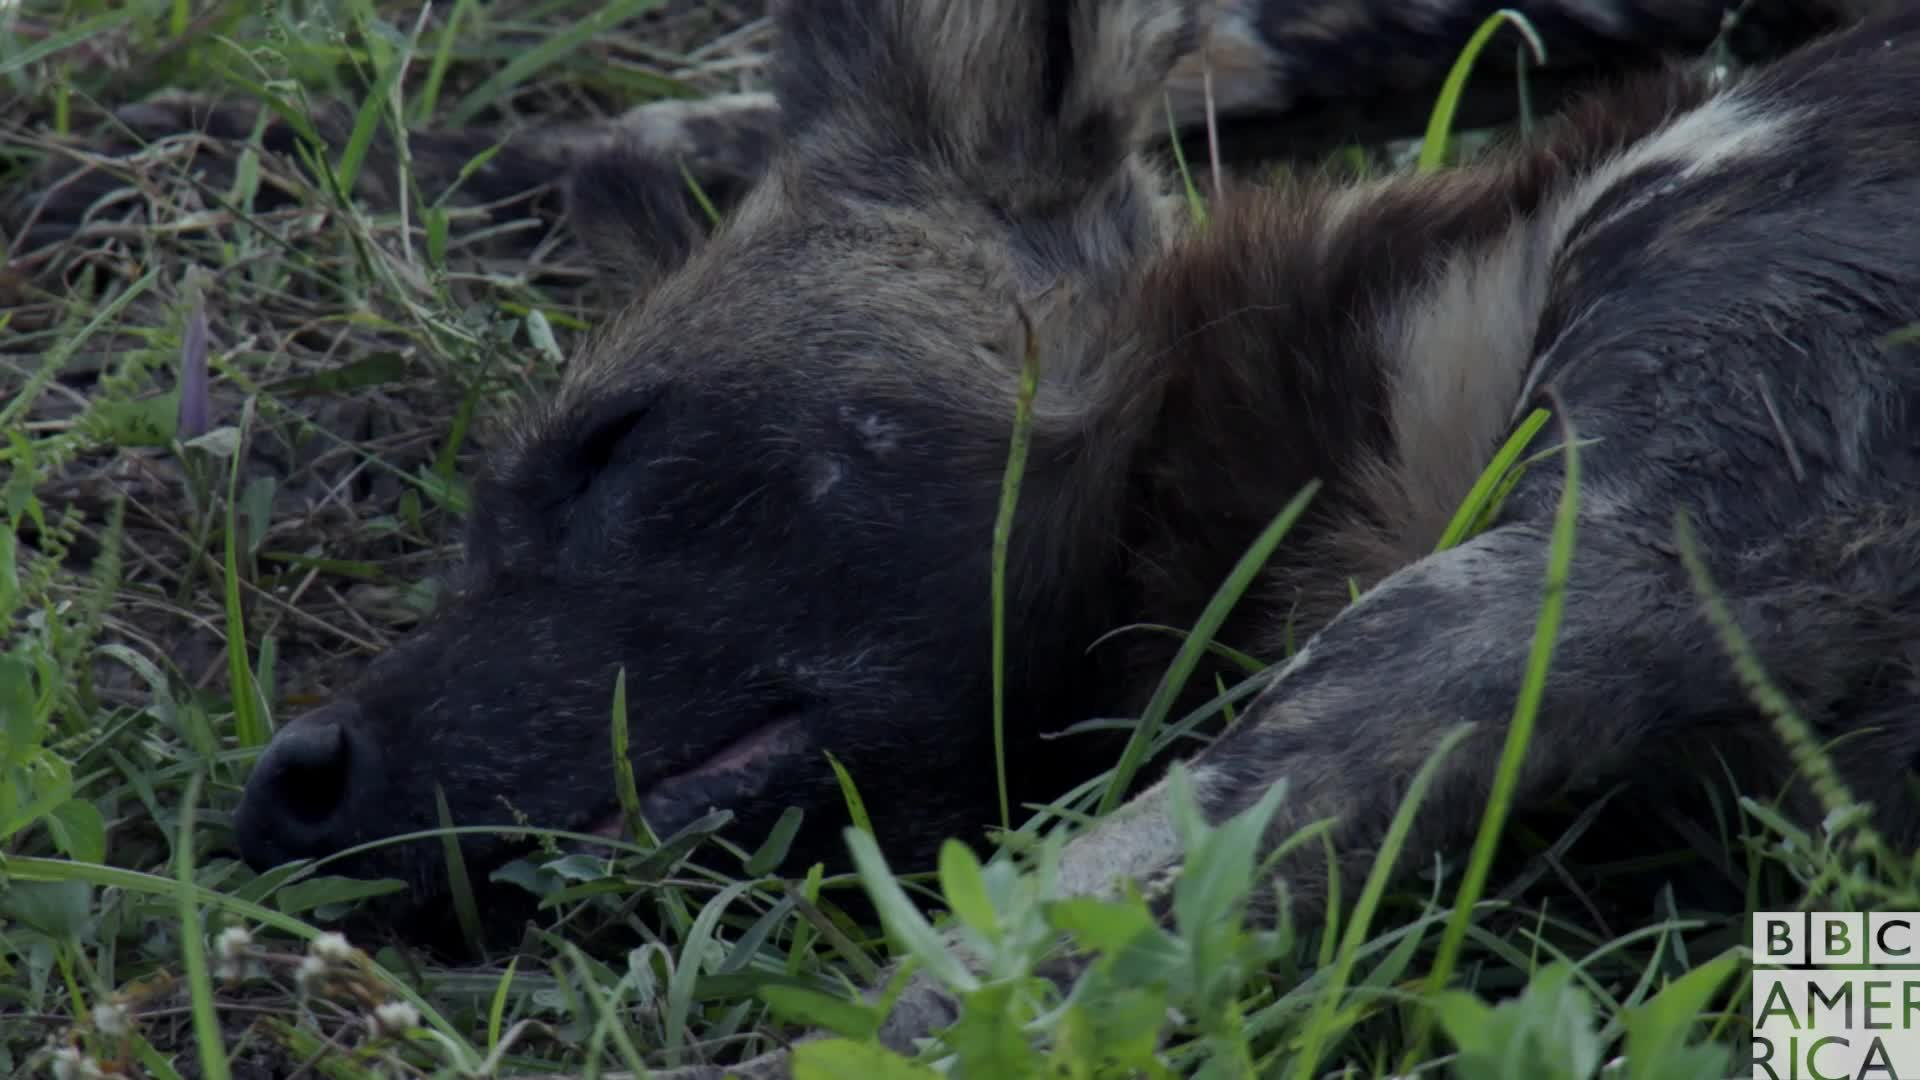 animal, animals, bbc america, bbc america dynasties, bbc america: dynasties, dynasties, good morning, painted wolf, painted wolves, sleepy, tired, wake up, wolf, wolves, Dynasties Wolf Wakes Up GIFs